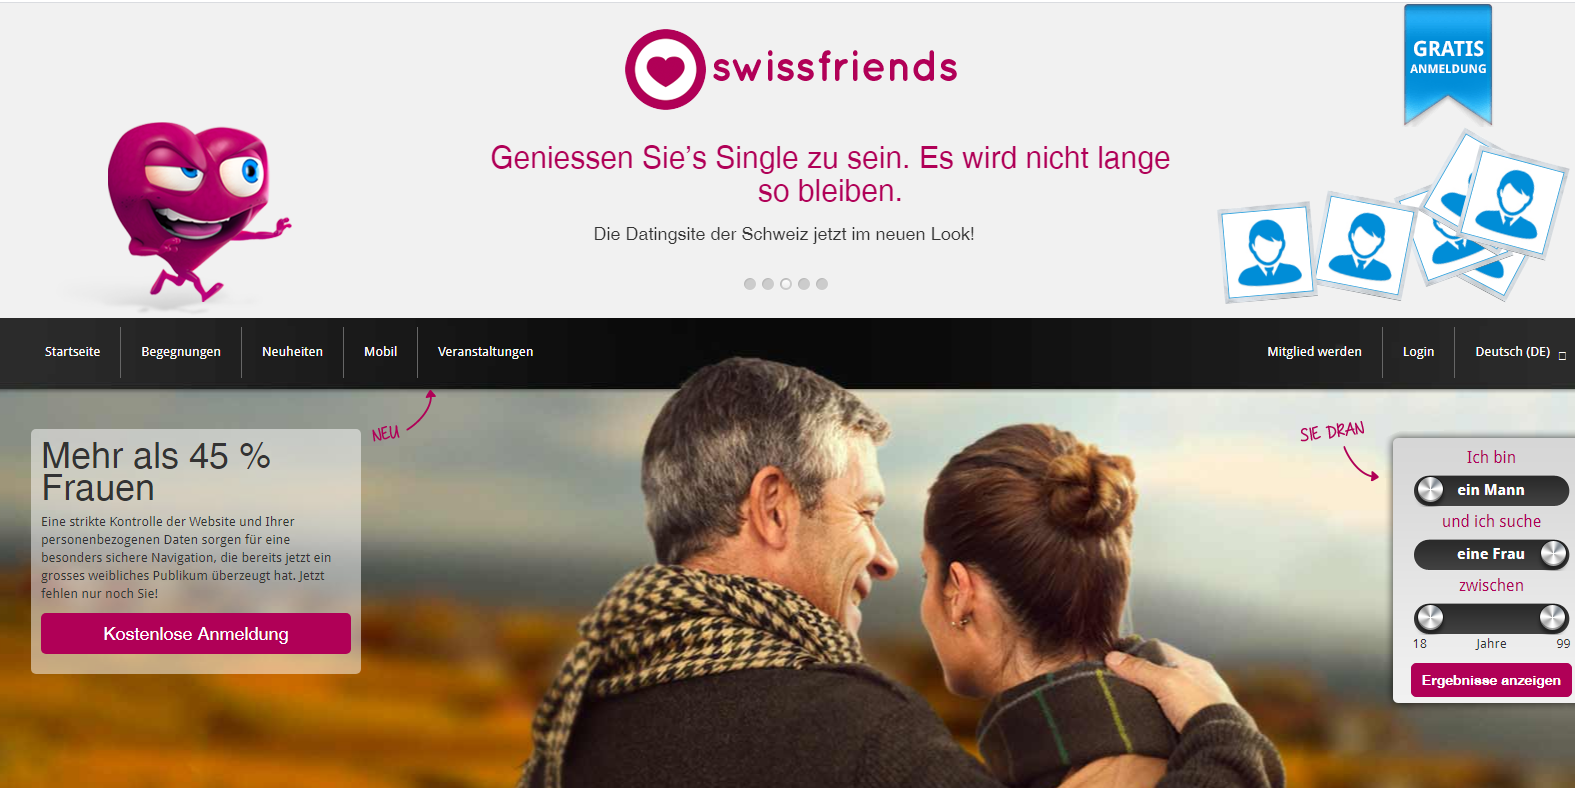 Casual dating kostenlos schweiz